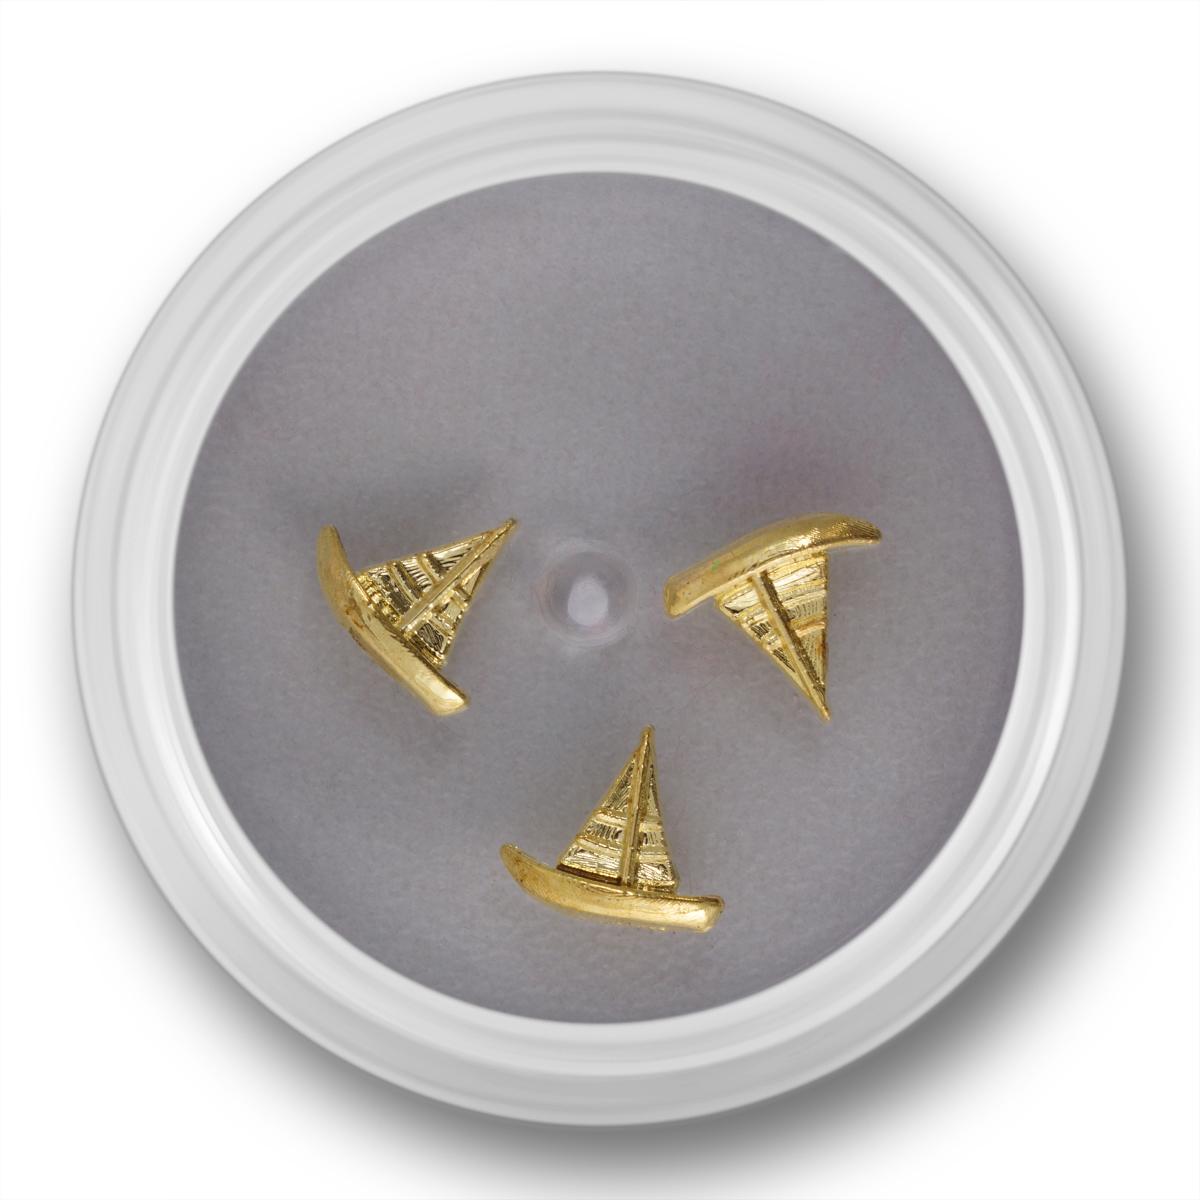 Image of   Negle smykke, skib, guld, 3 stk